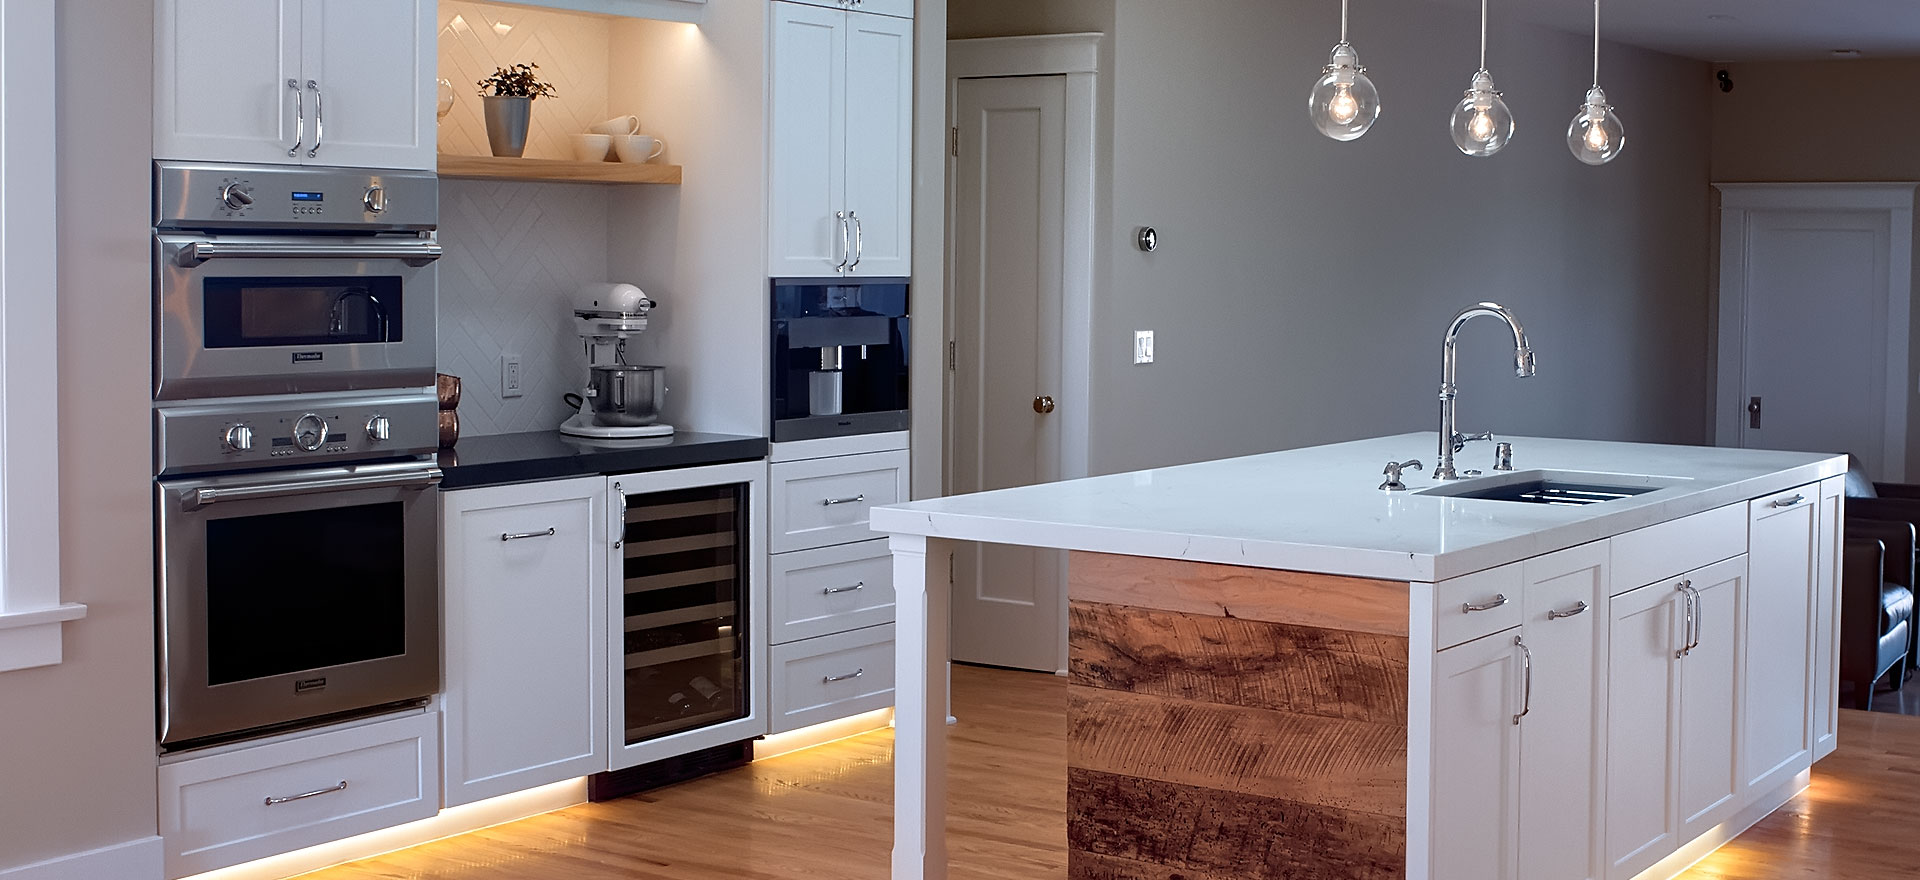 Kitchen Remodel in Mar Vista by Luxus Construction